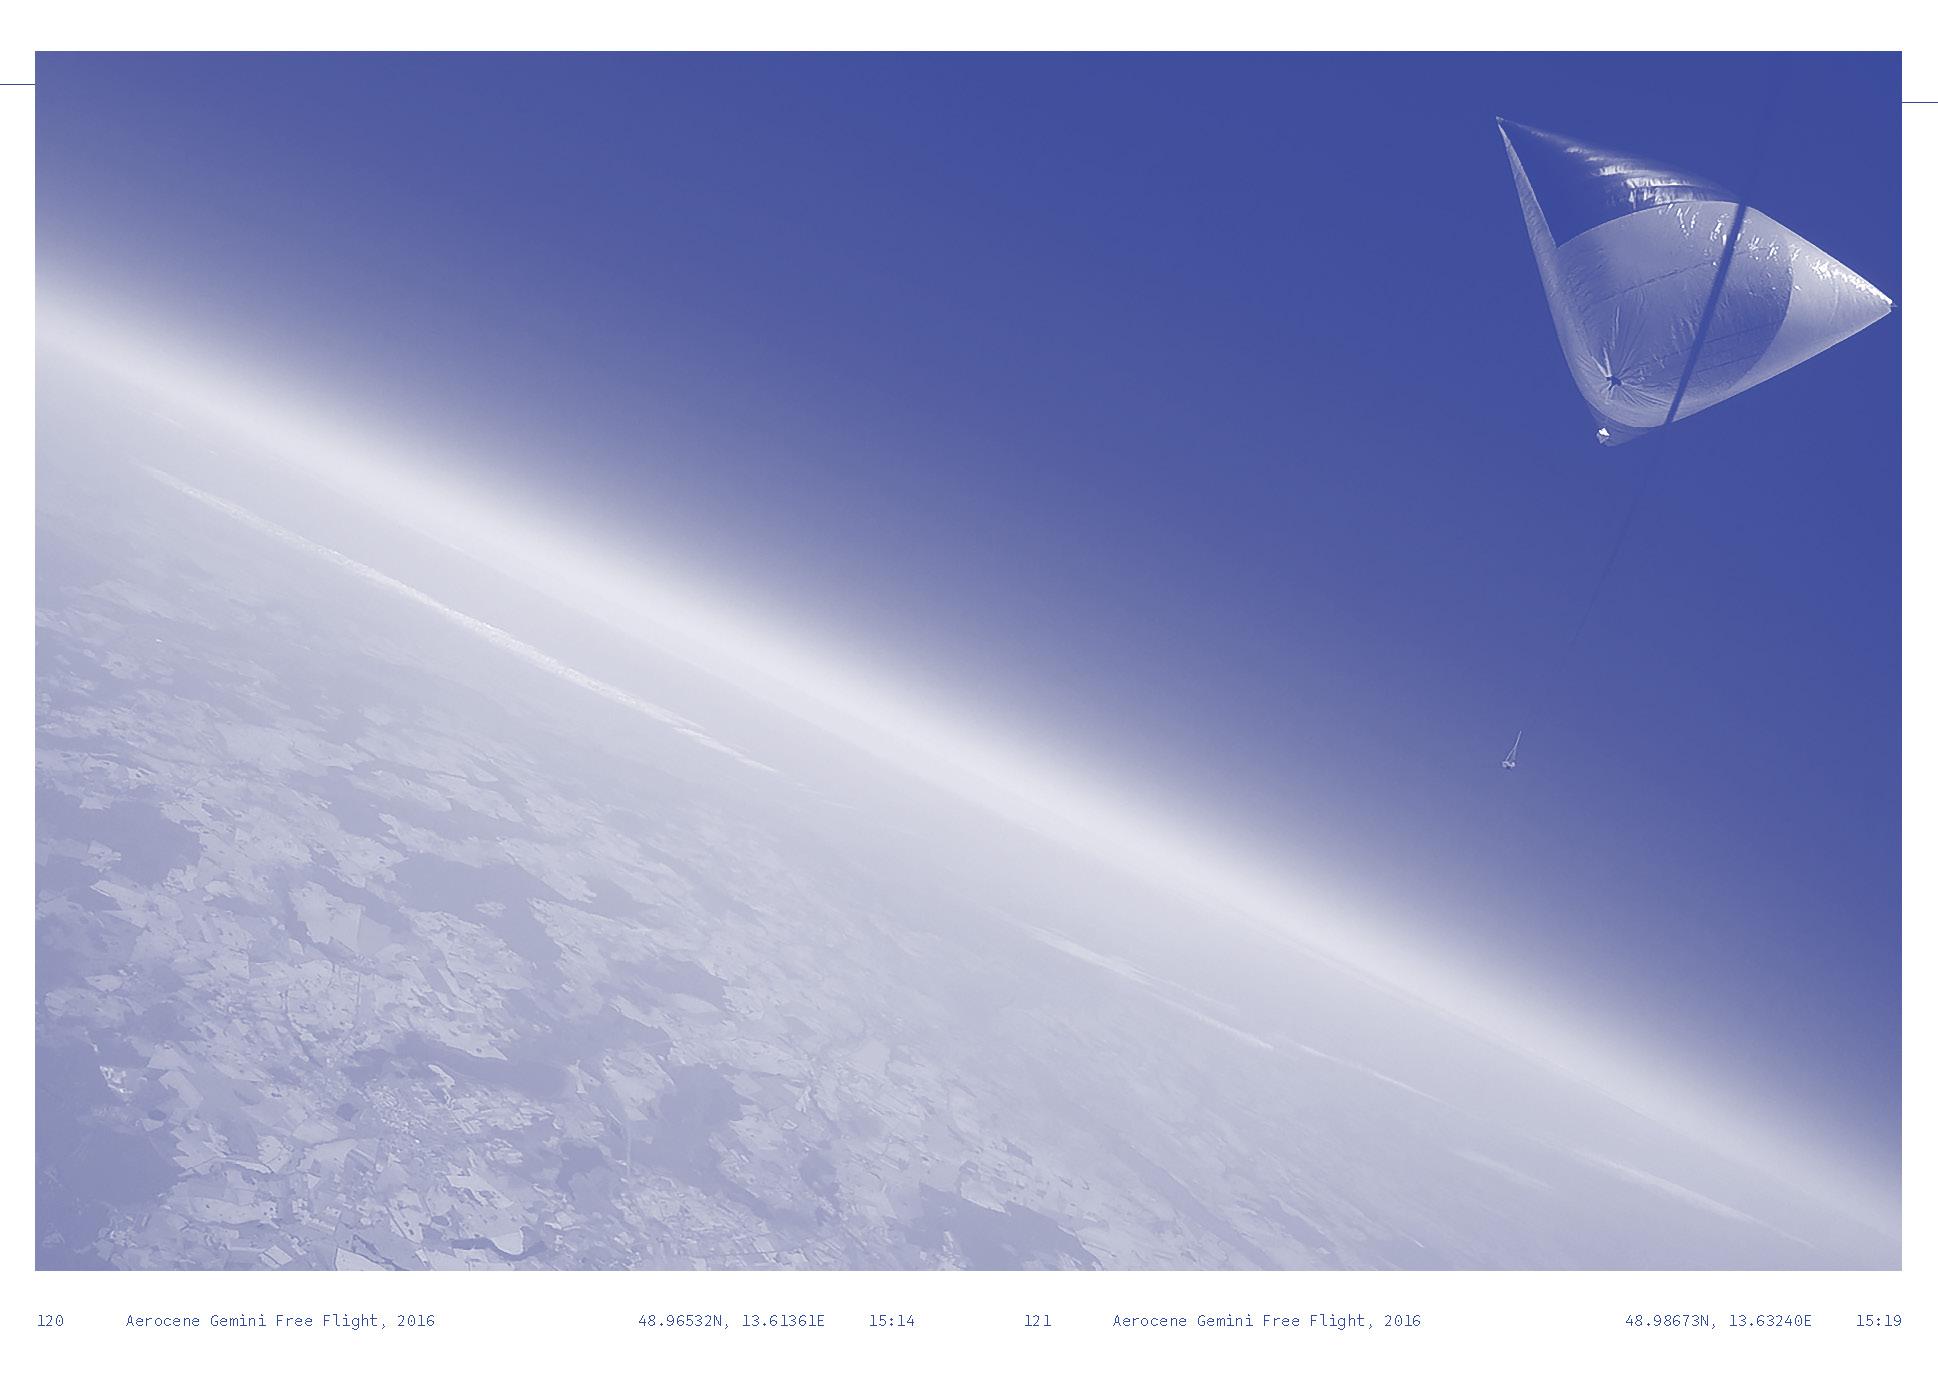 20AE_MovementsfortheAir_Aerocene (1)_Page_061